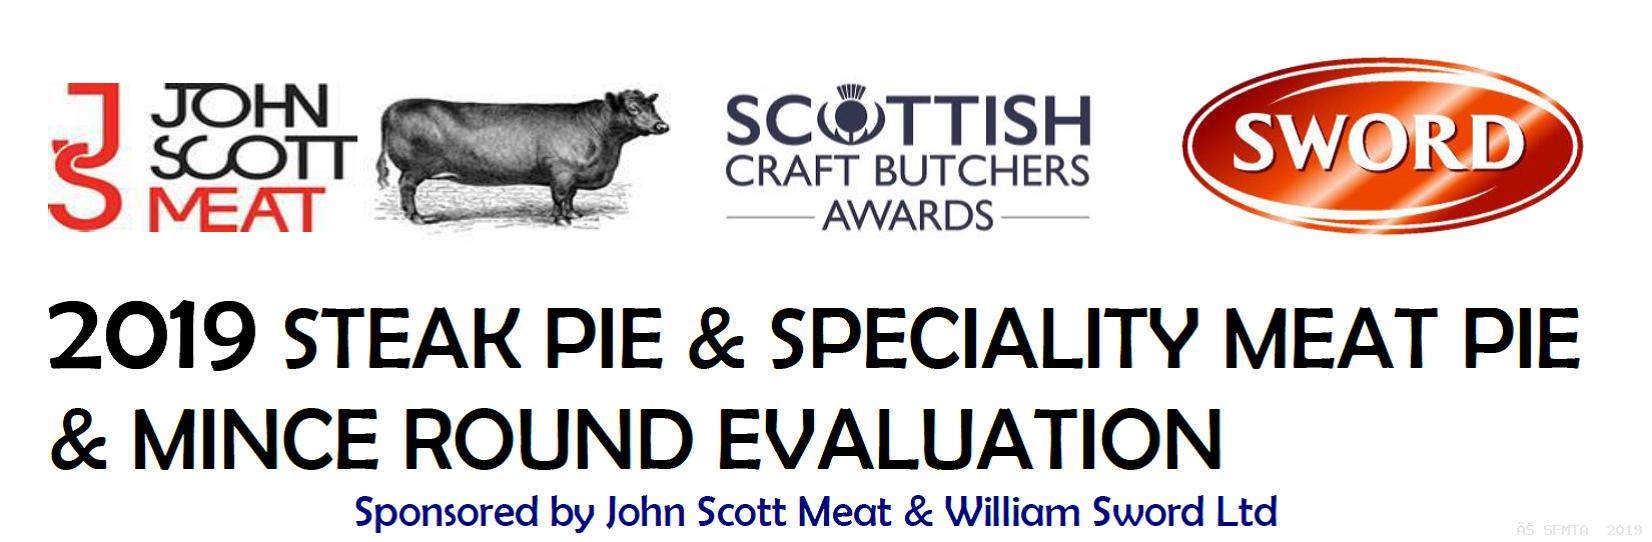 Scottish Craft Butchers | 2019_STEAK_PIE,_SPECIALITY_MEAT_PIE_